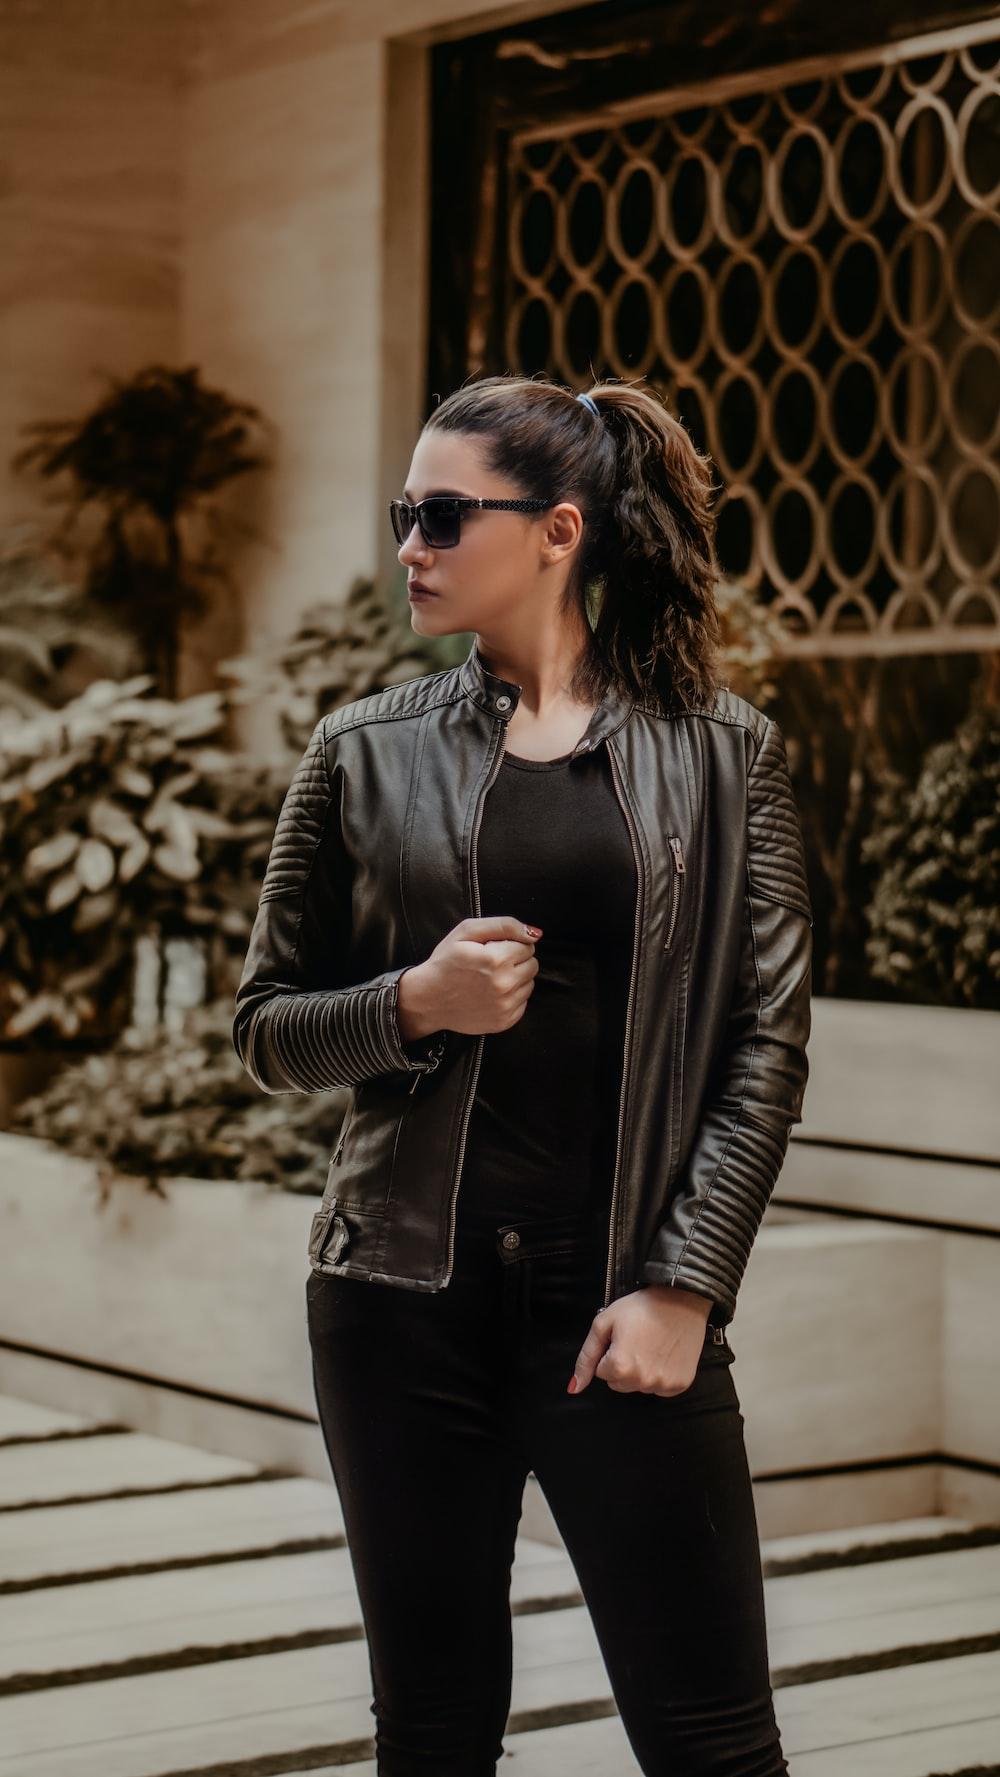 woman in black leather jacket wearing black sunglasses